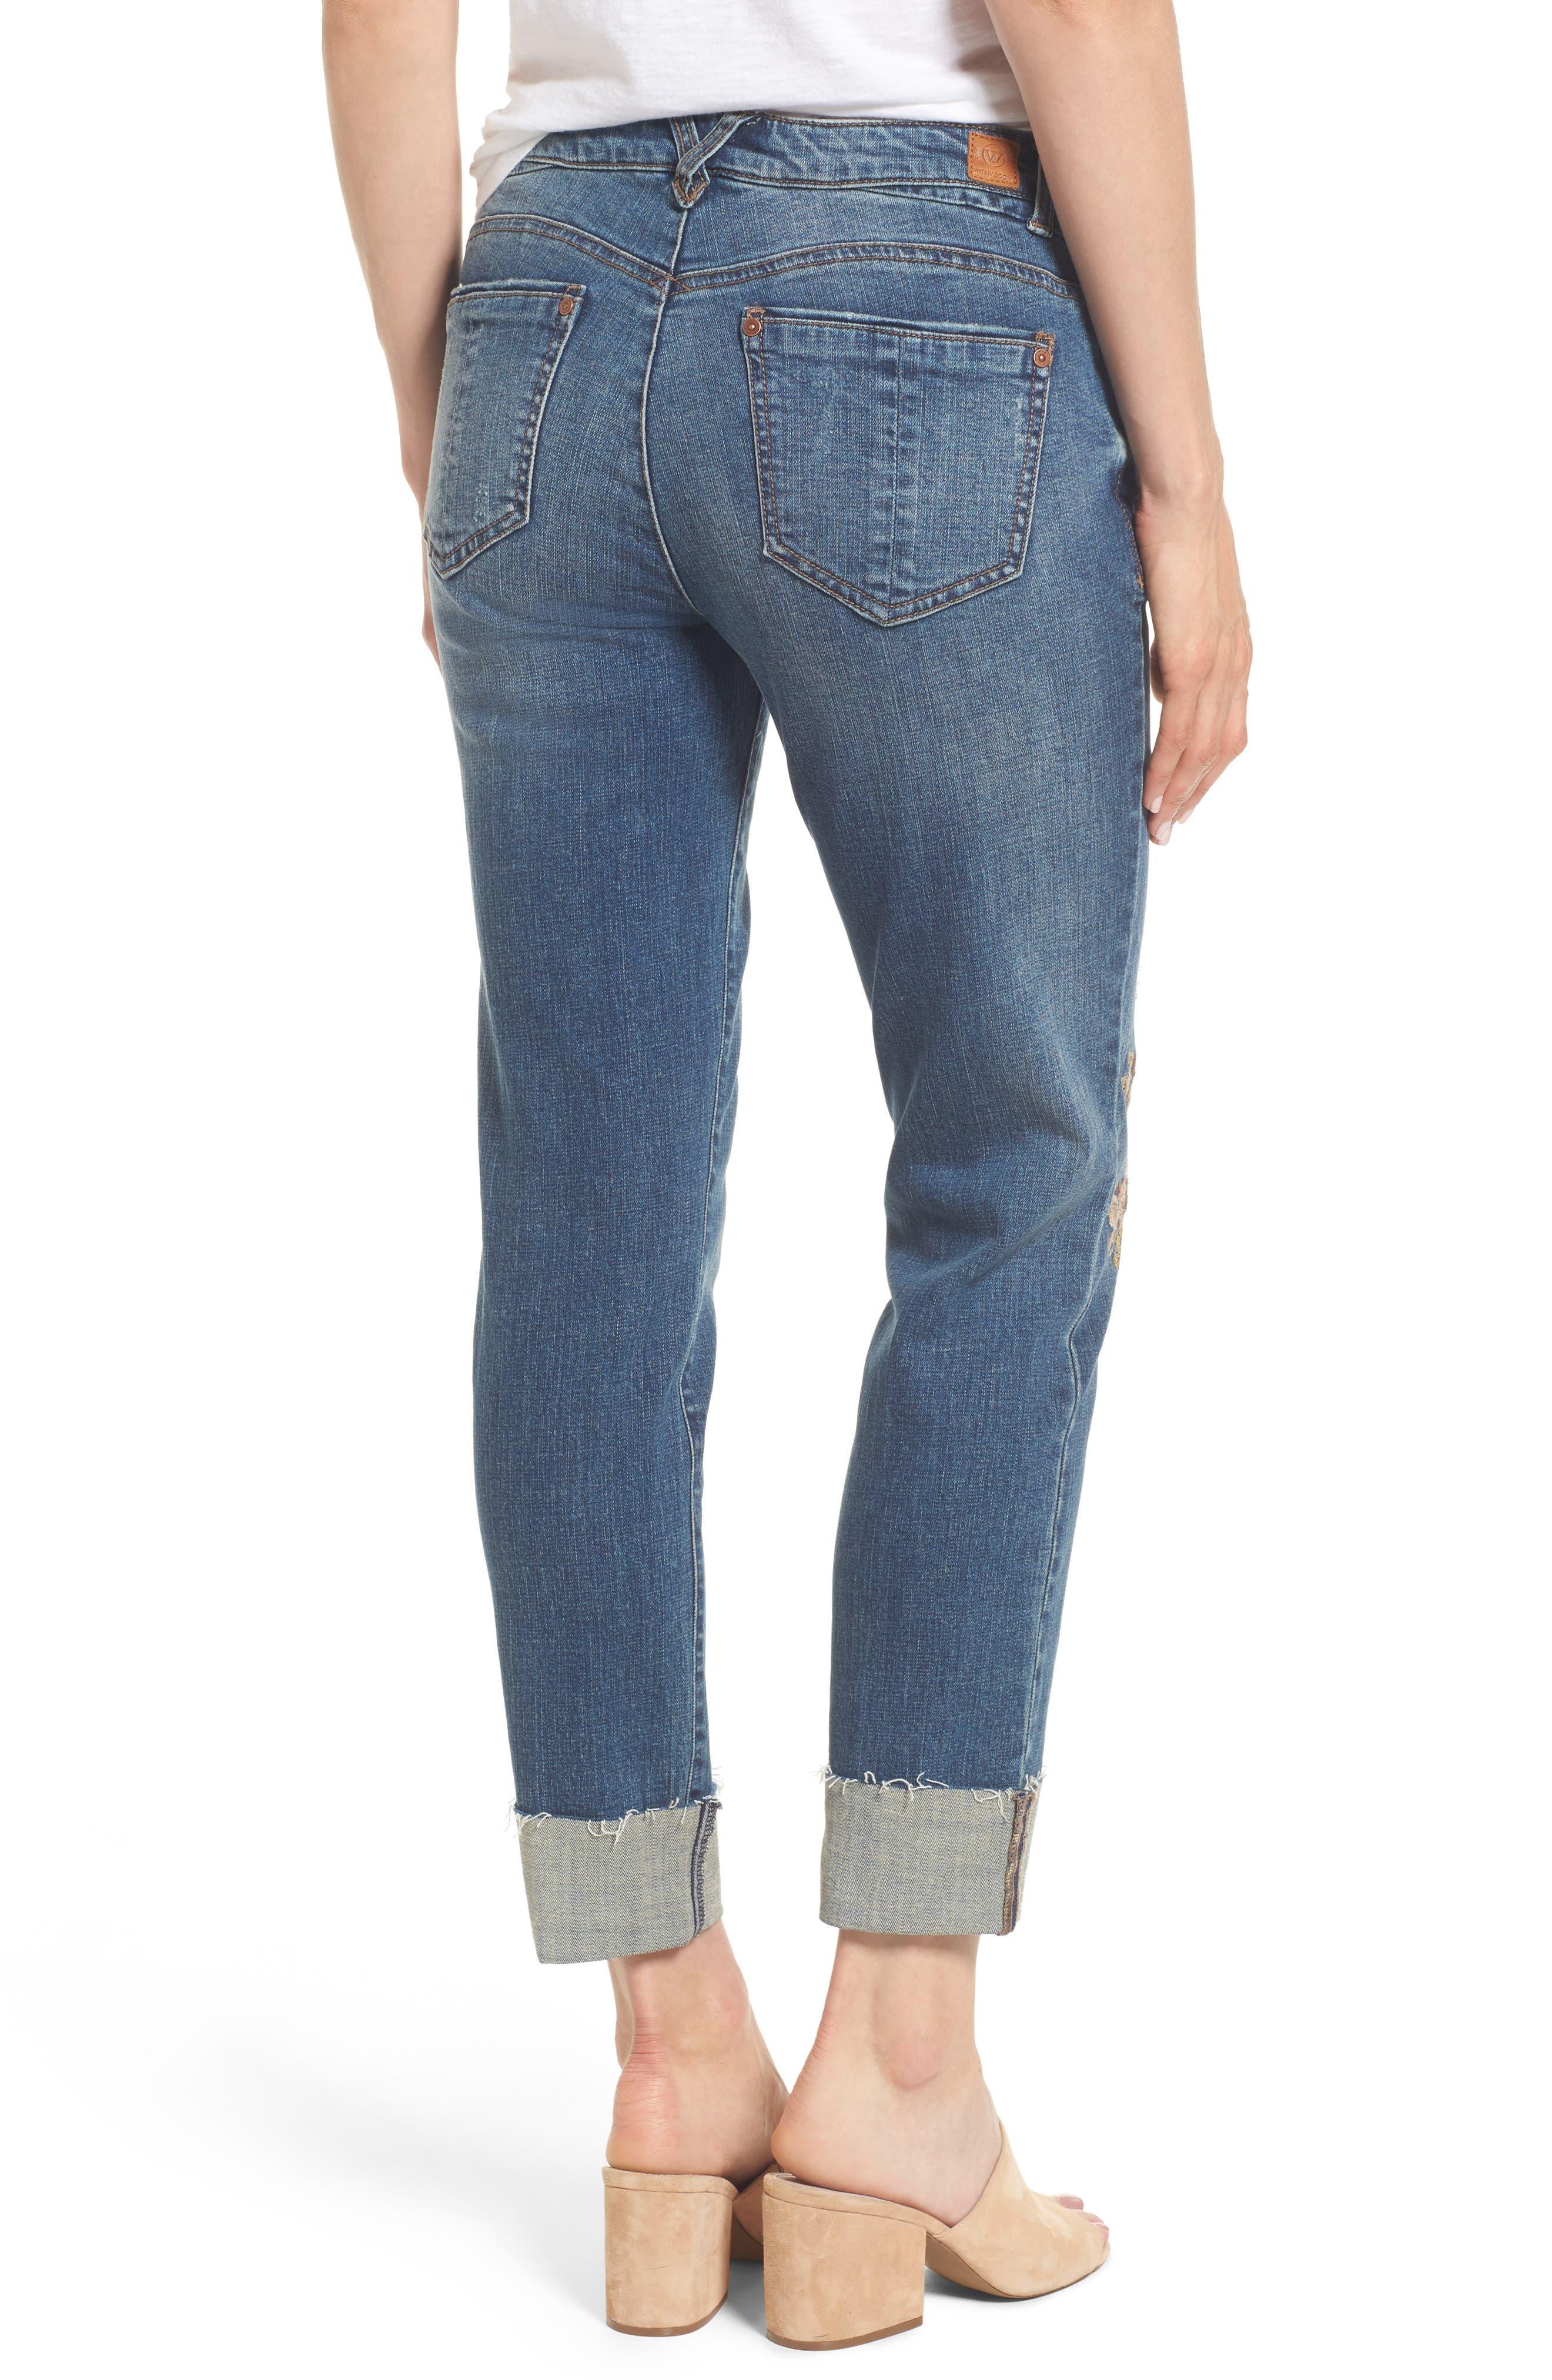 Alternate Image 2  - Wit & Wisdom Flex-ellent Embroidered Boyfriend Jeans (Nordstrom Exclusive) (Regular & Petite)